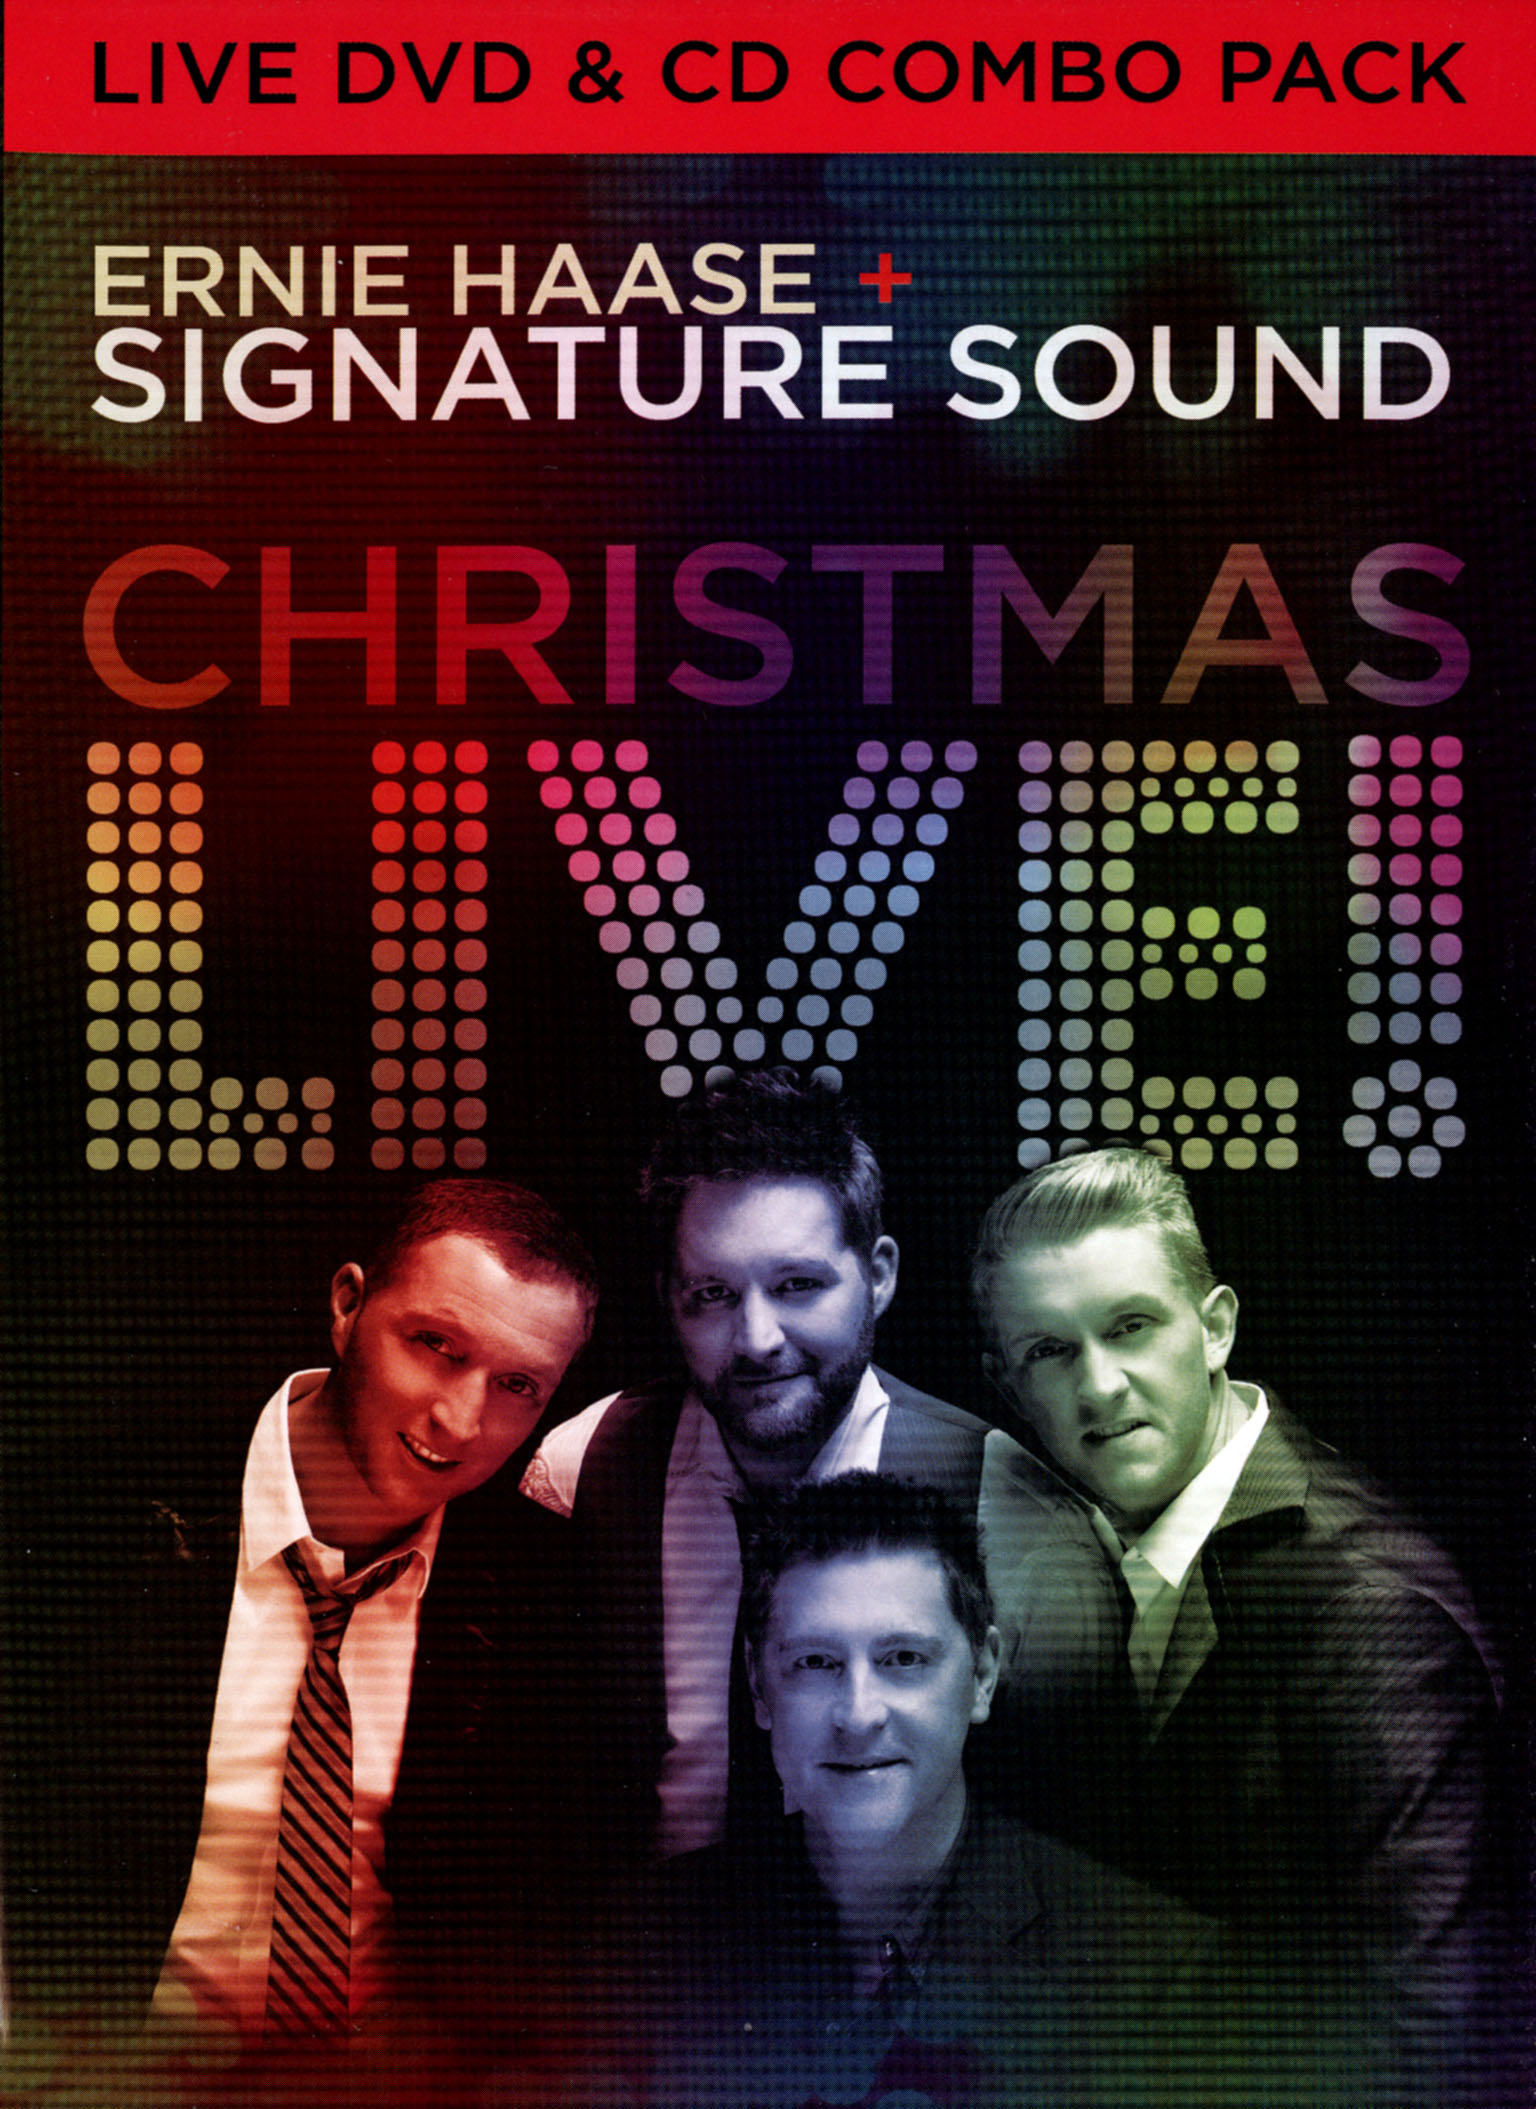 Ernie Haase + Signature Sound: Christmas Live!